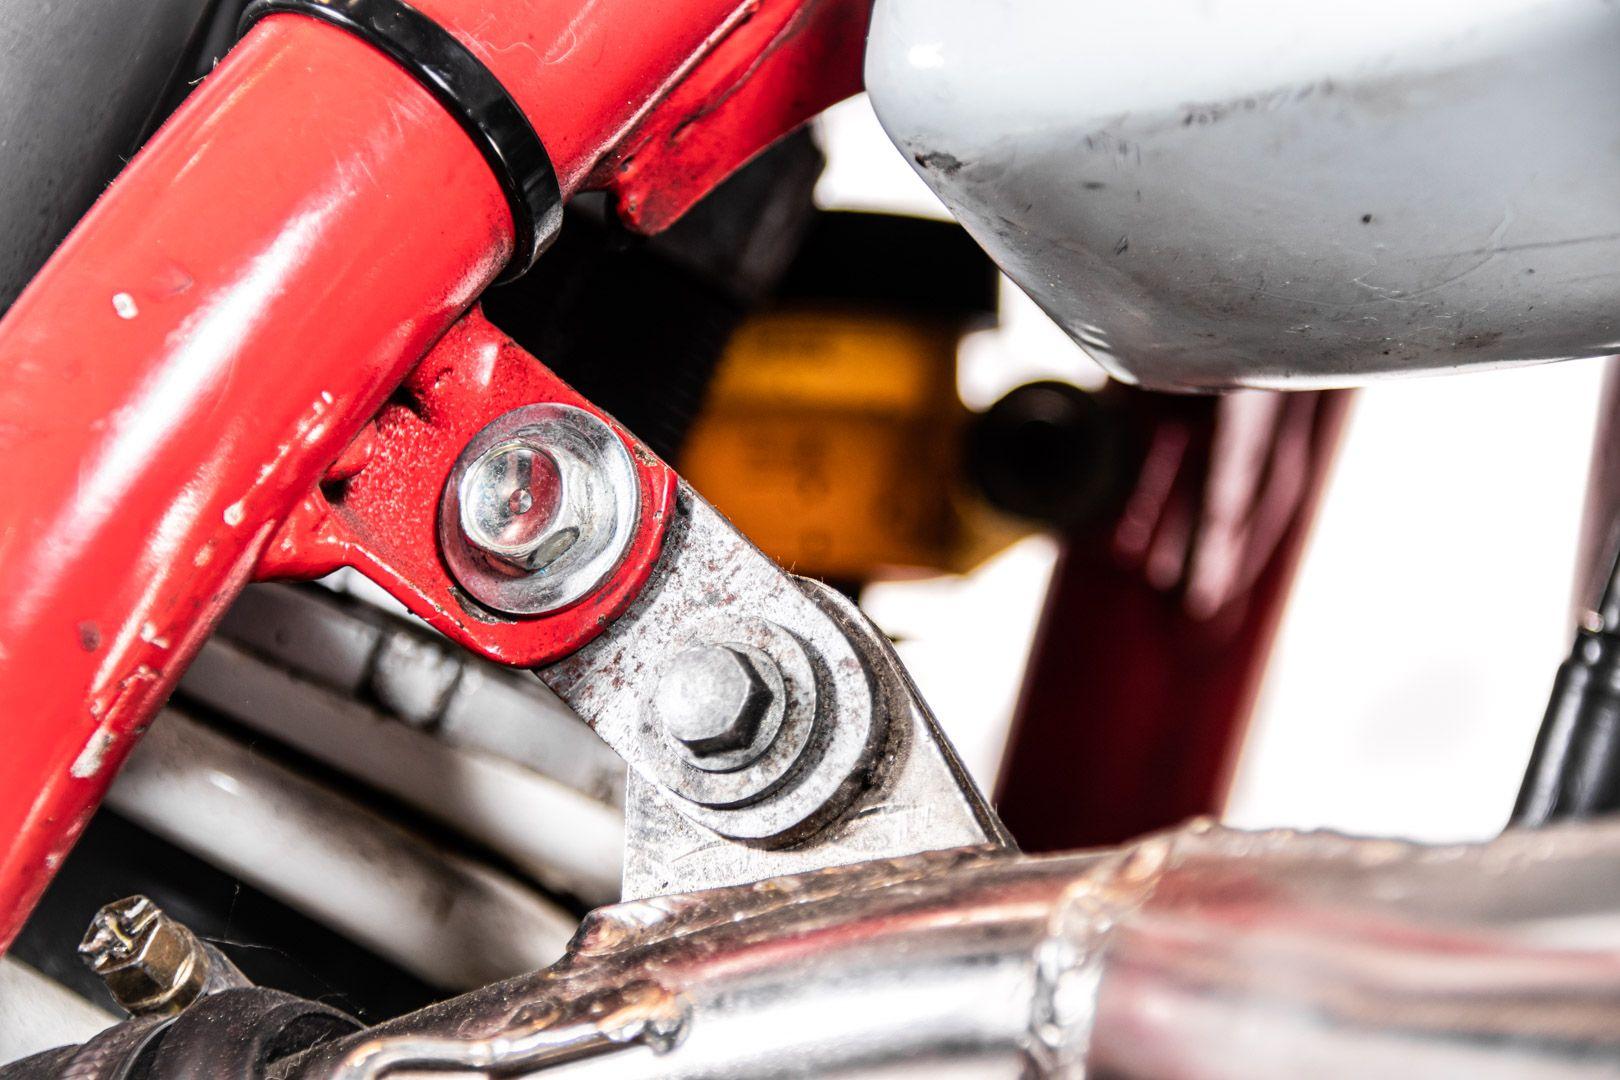 1991 KTM GS 250 82501